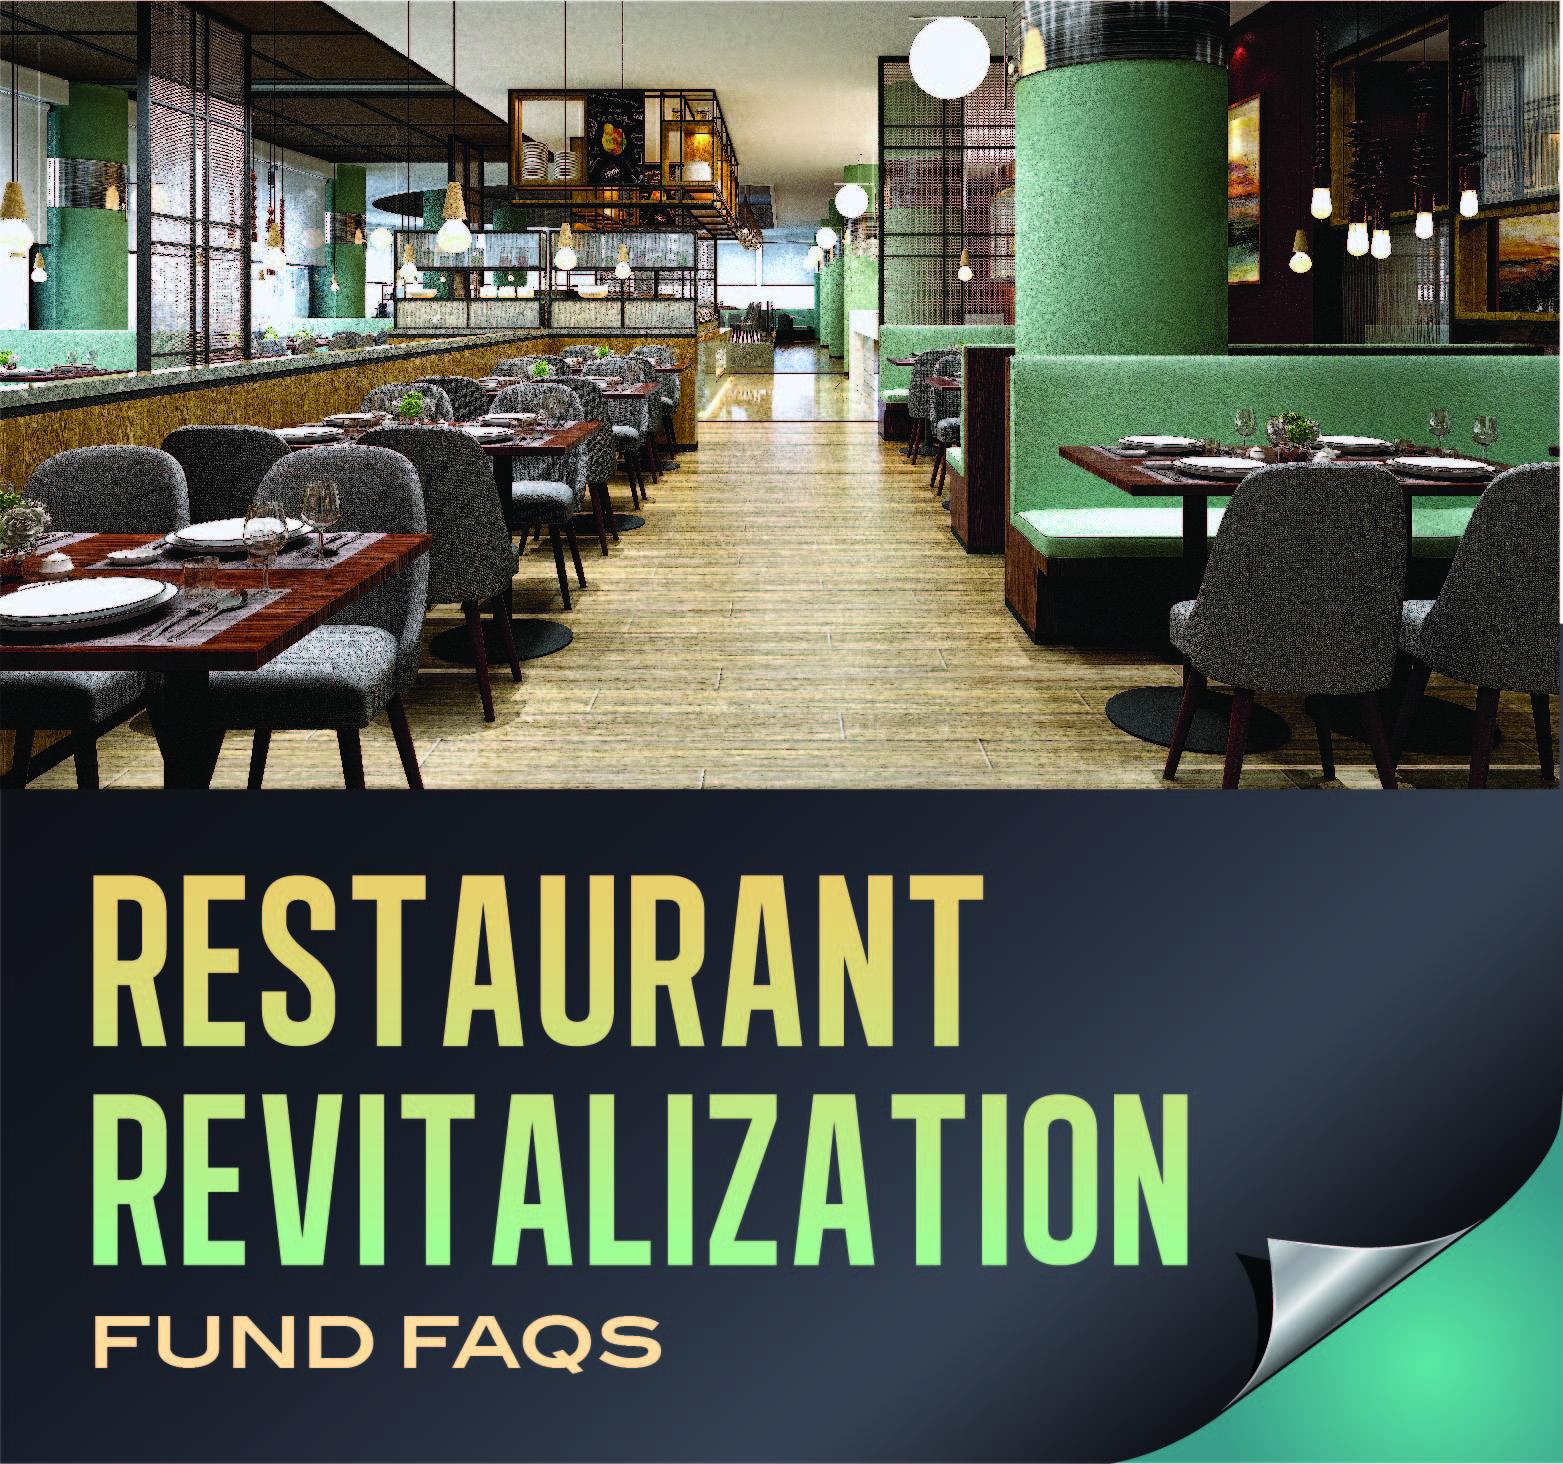 Restaurant Revitalization Fund FAQs